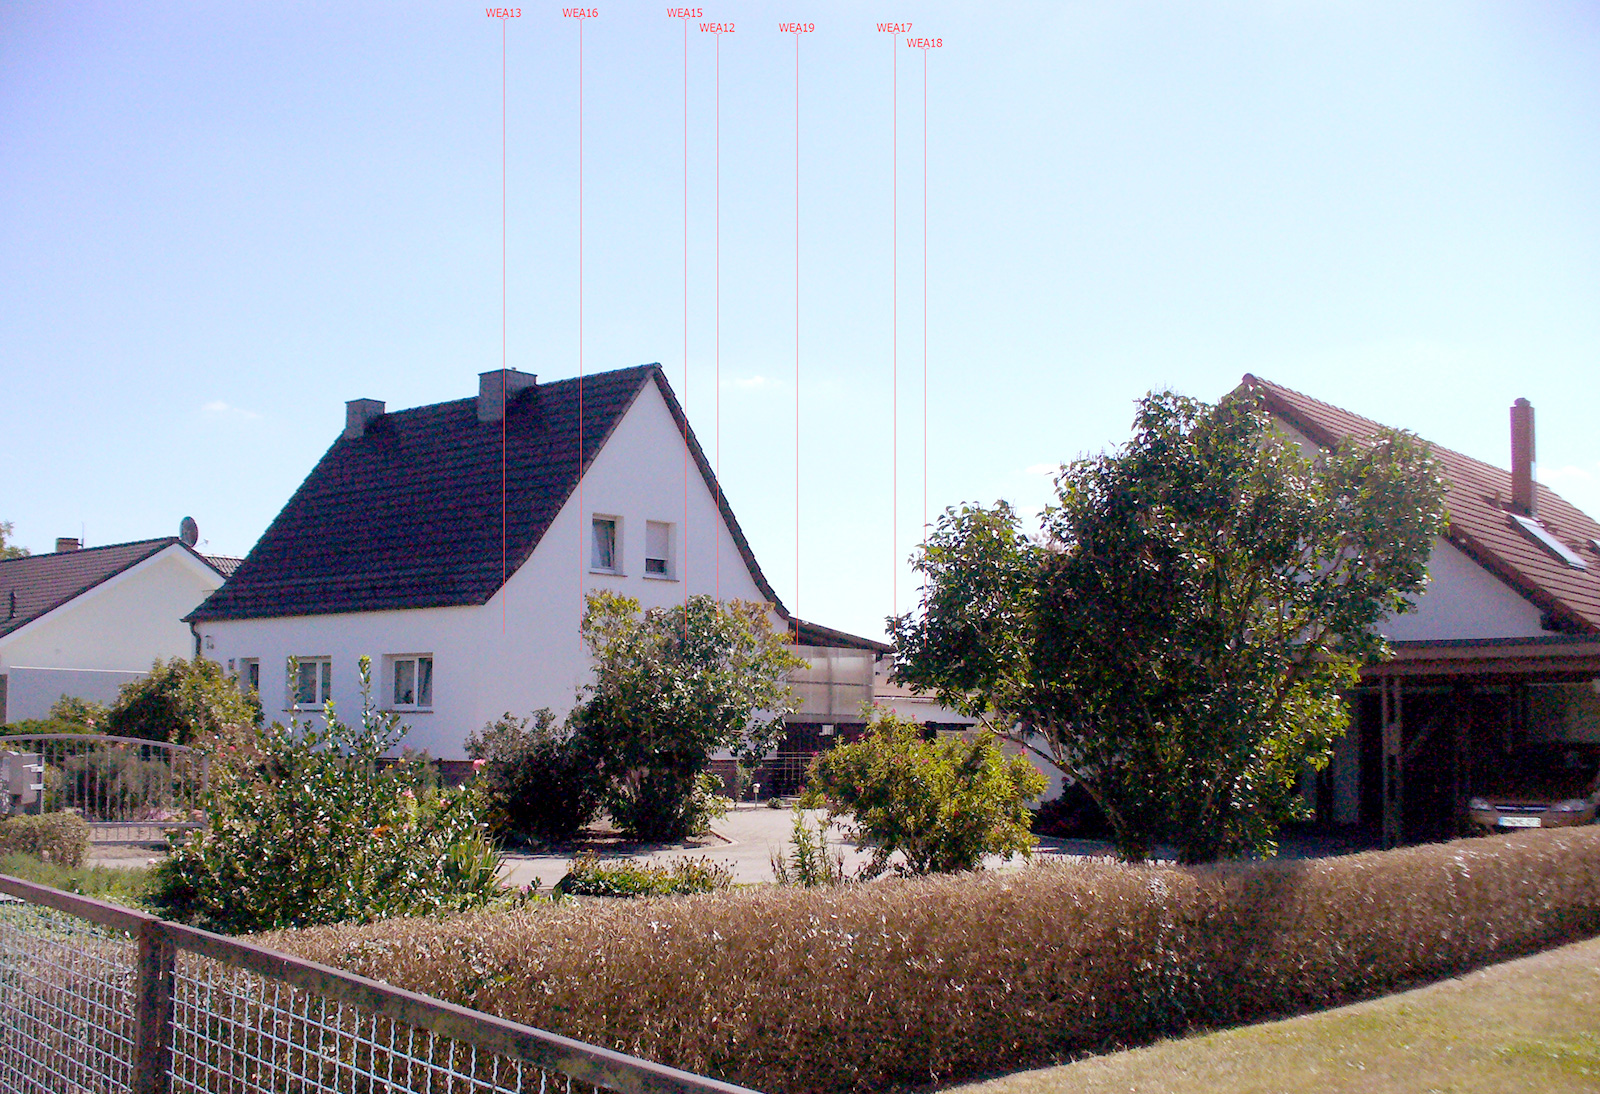 Göhlsdorf Position 1 Visualisierung